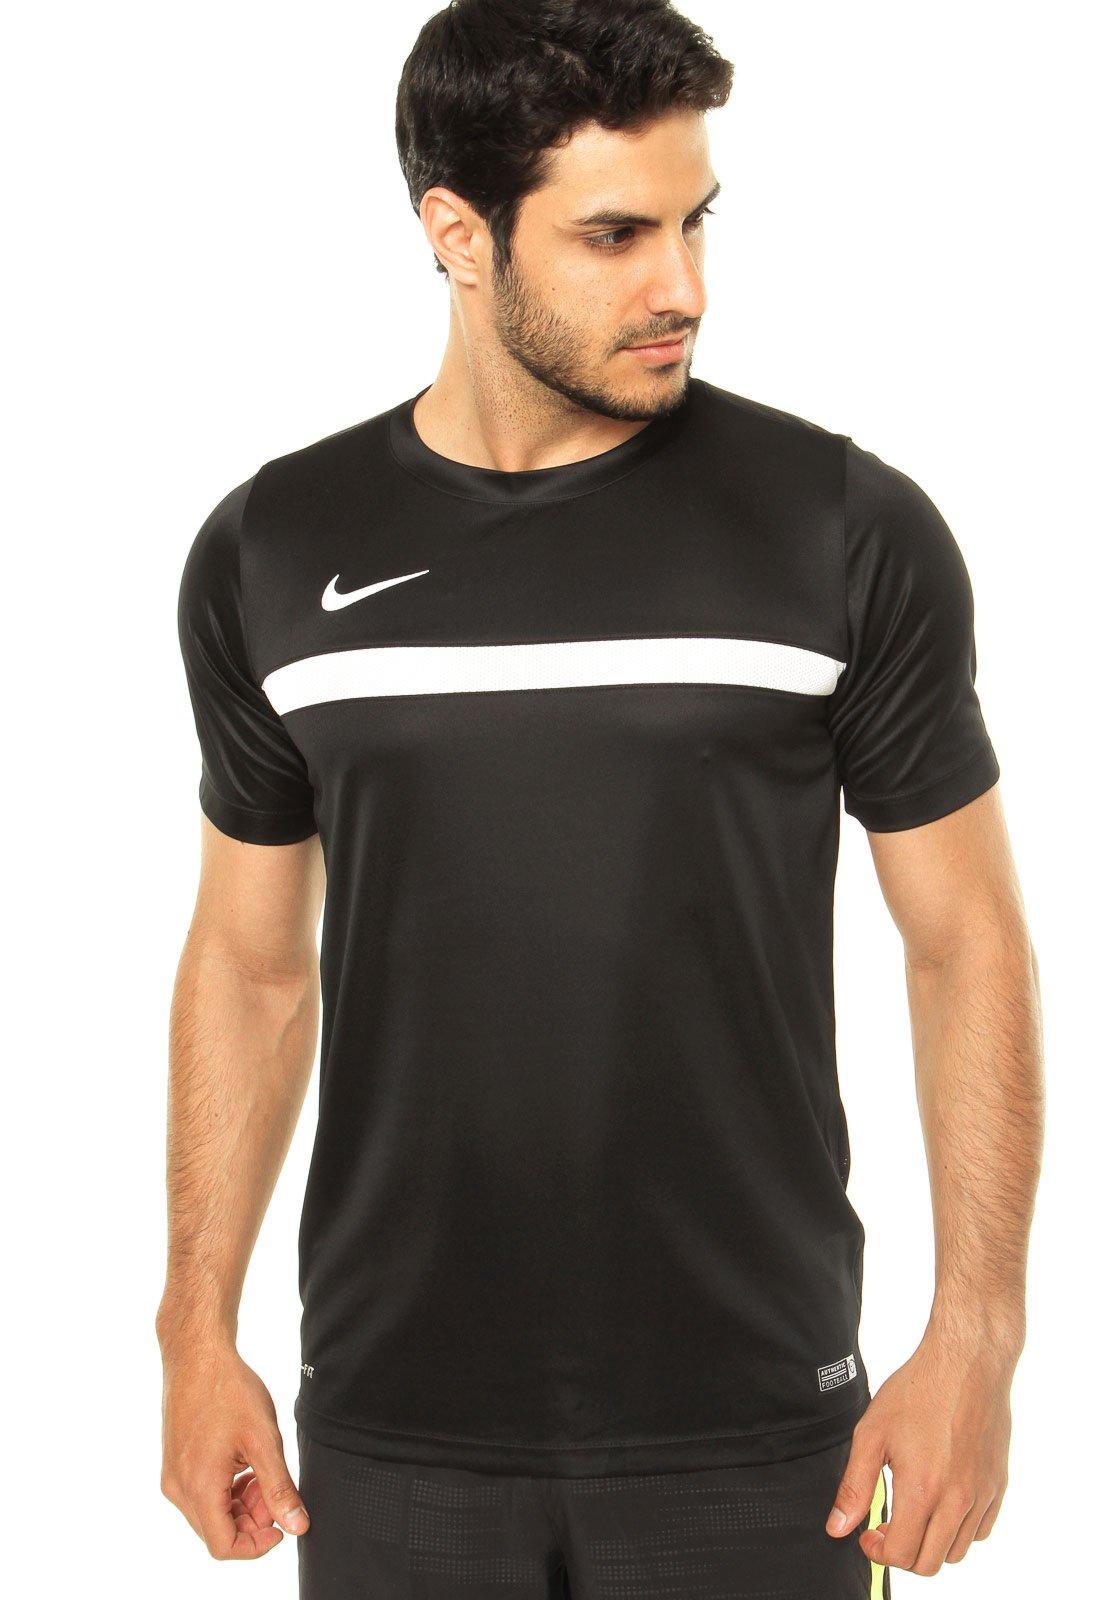 condado traductor Novedad  Camiseta Nike Academy Training 1 Preta - Compre Agora | Dafiti Brasil